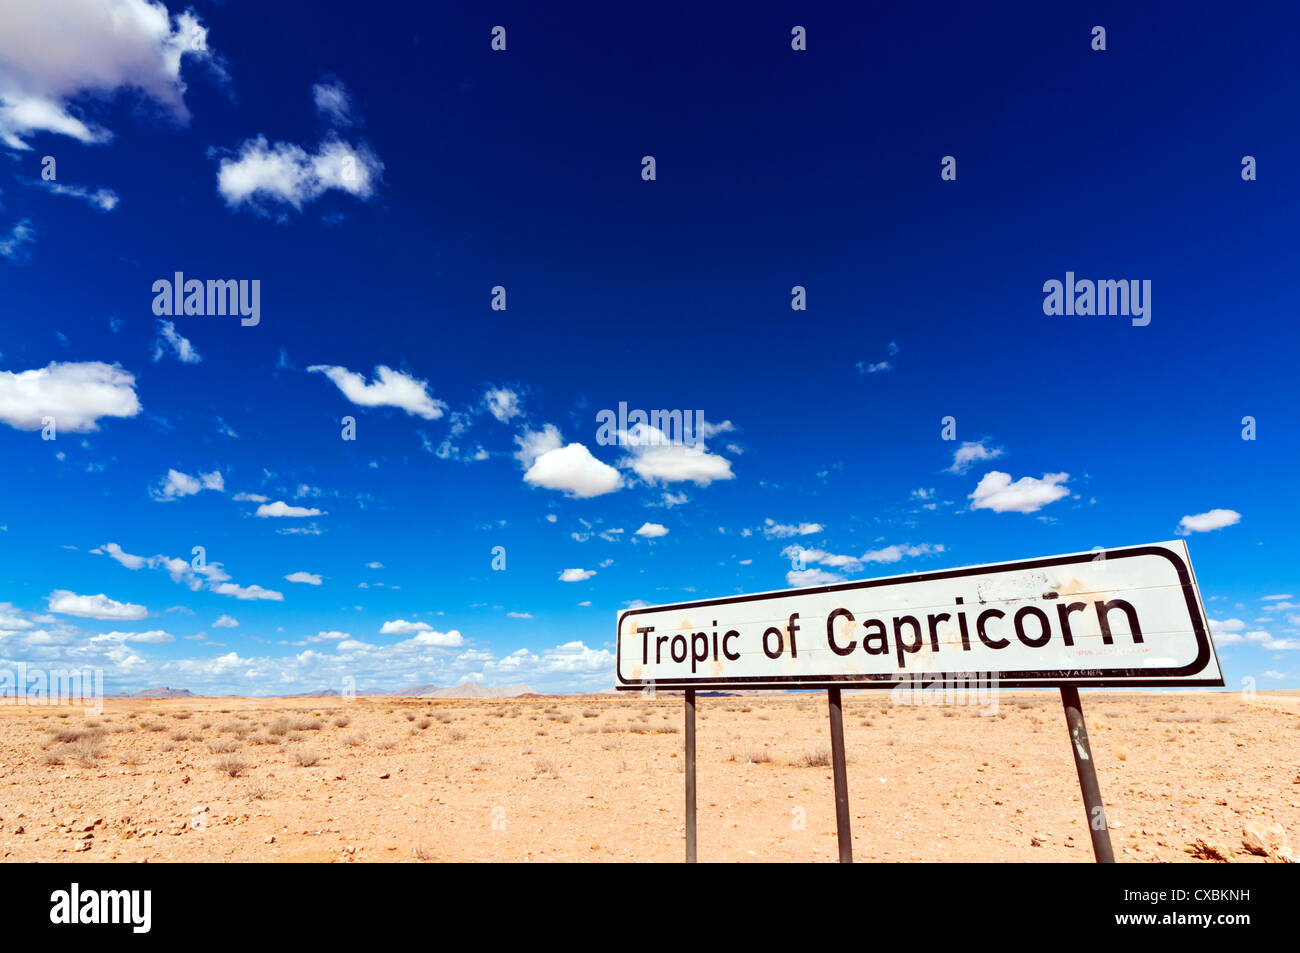 Tropic of Capricorn sign, Namib desert, Namibia, Africa - Stock Image